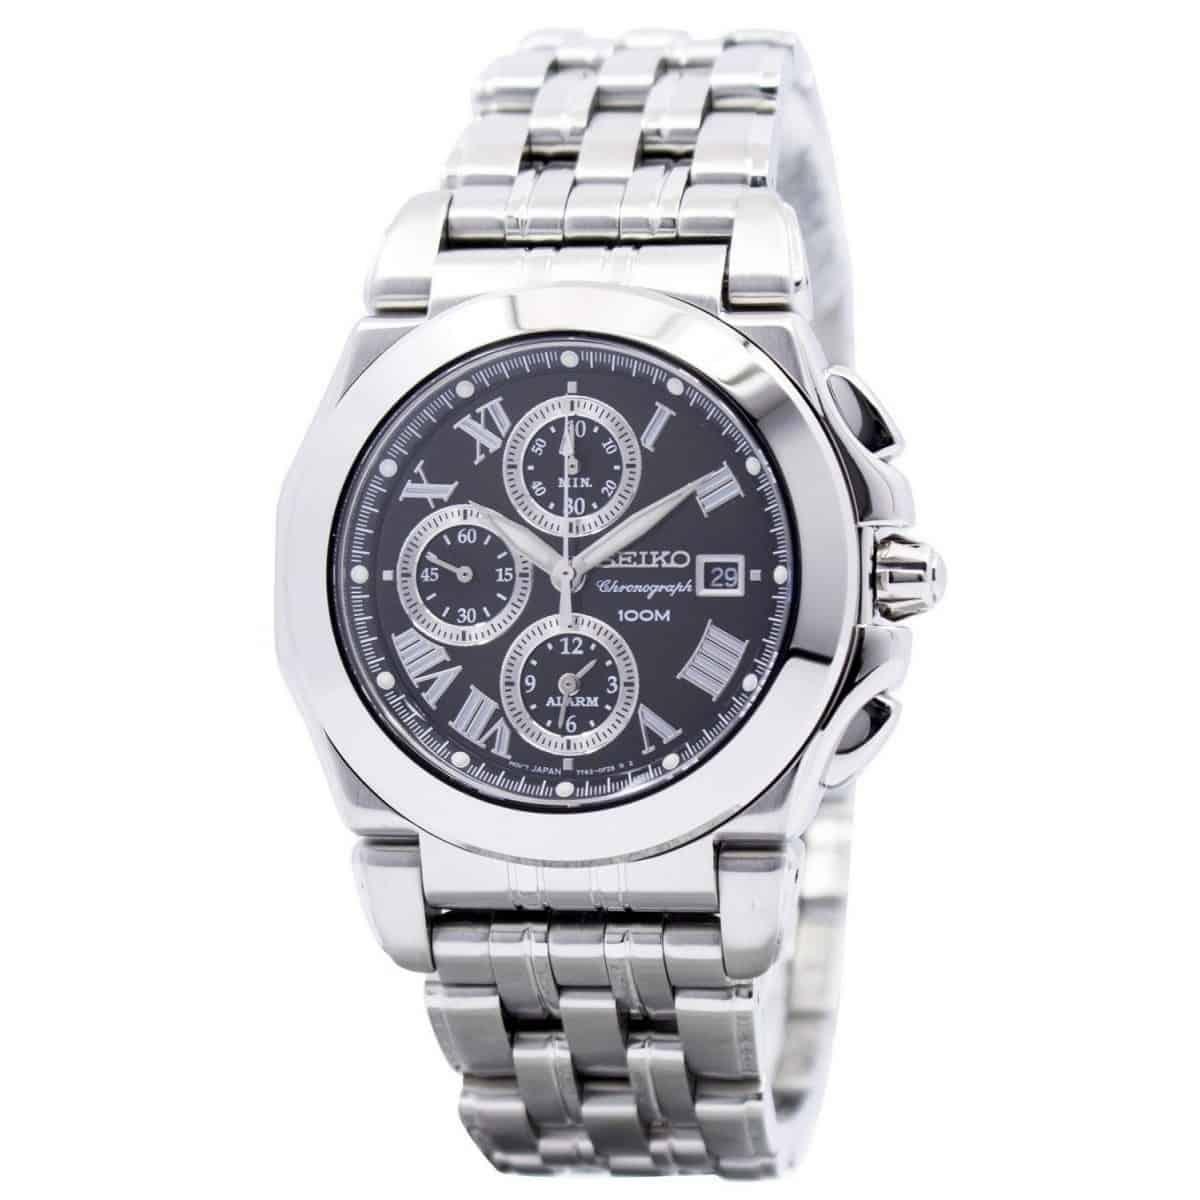 3fc1b2049f9 Analog watch for men with leather strap Hugo Boss Orange